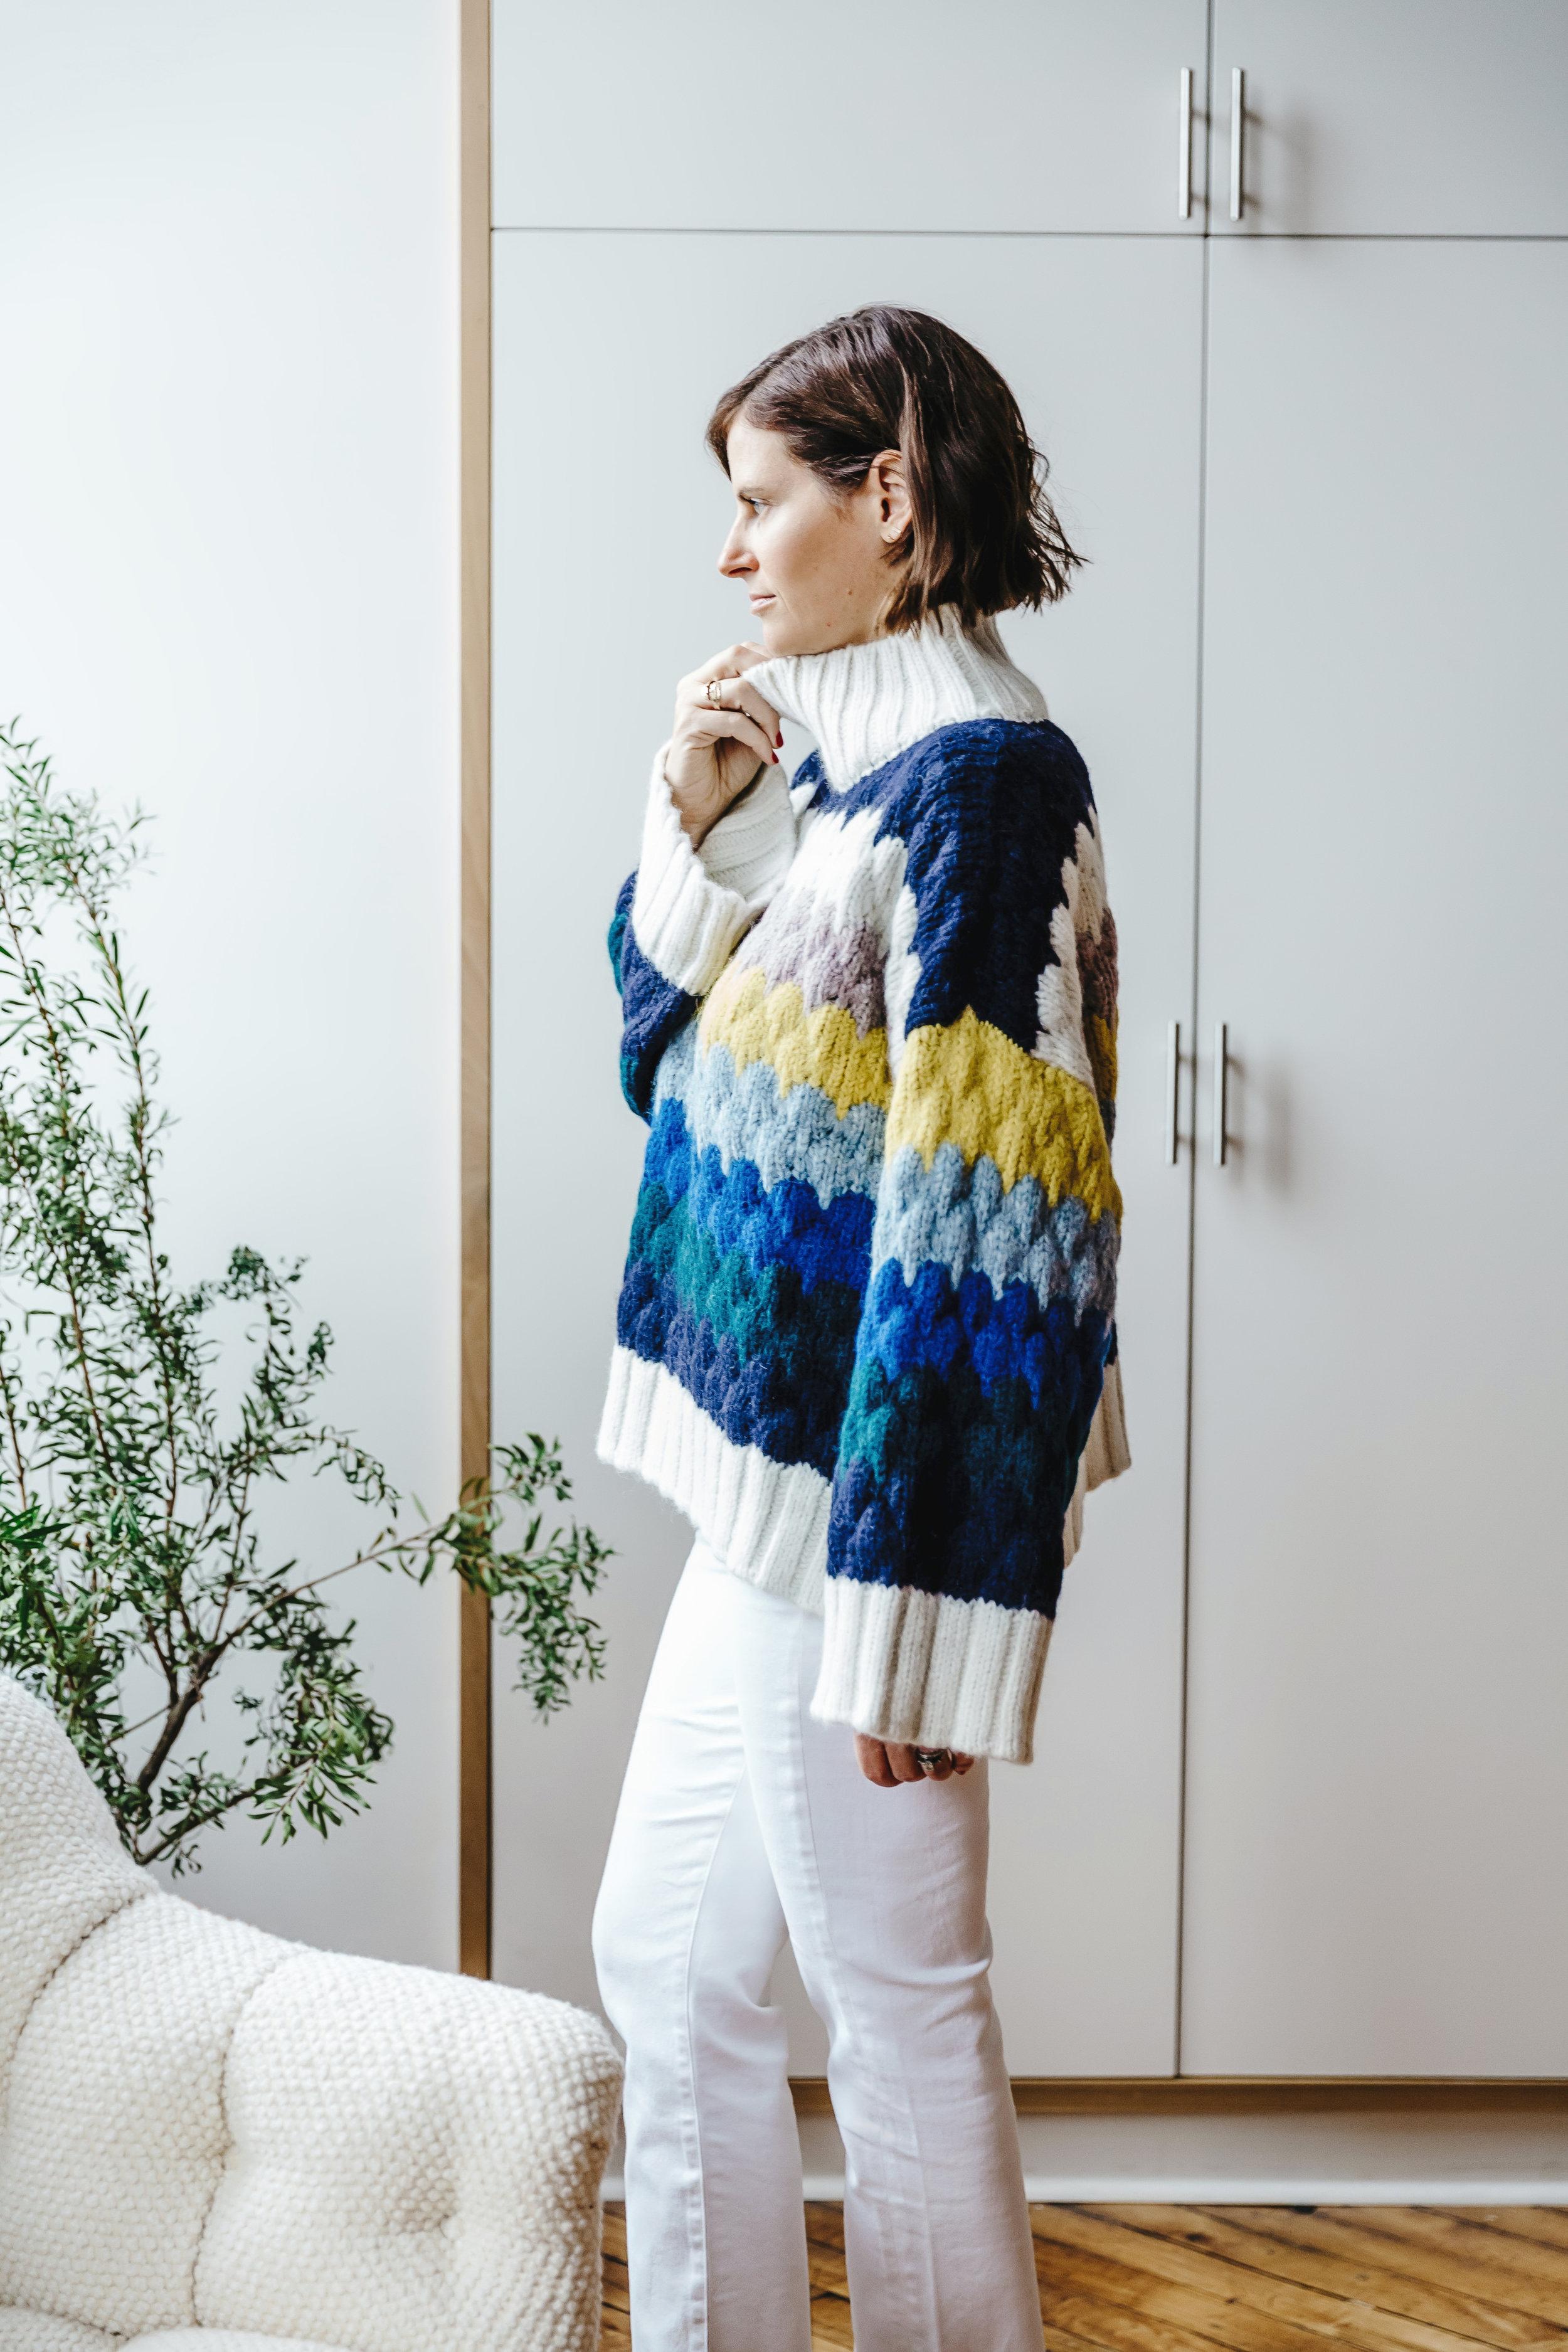 Courtney wears the  Freya sweater  in Multi-color